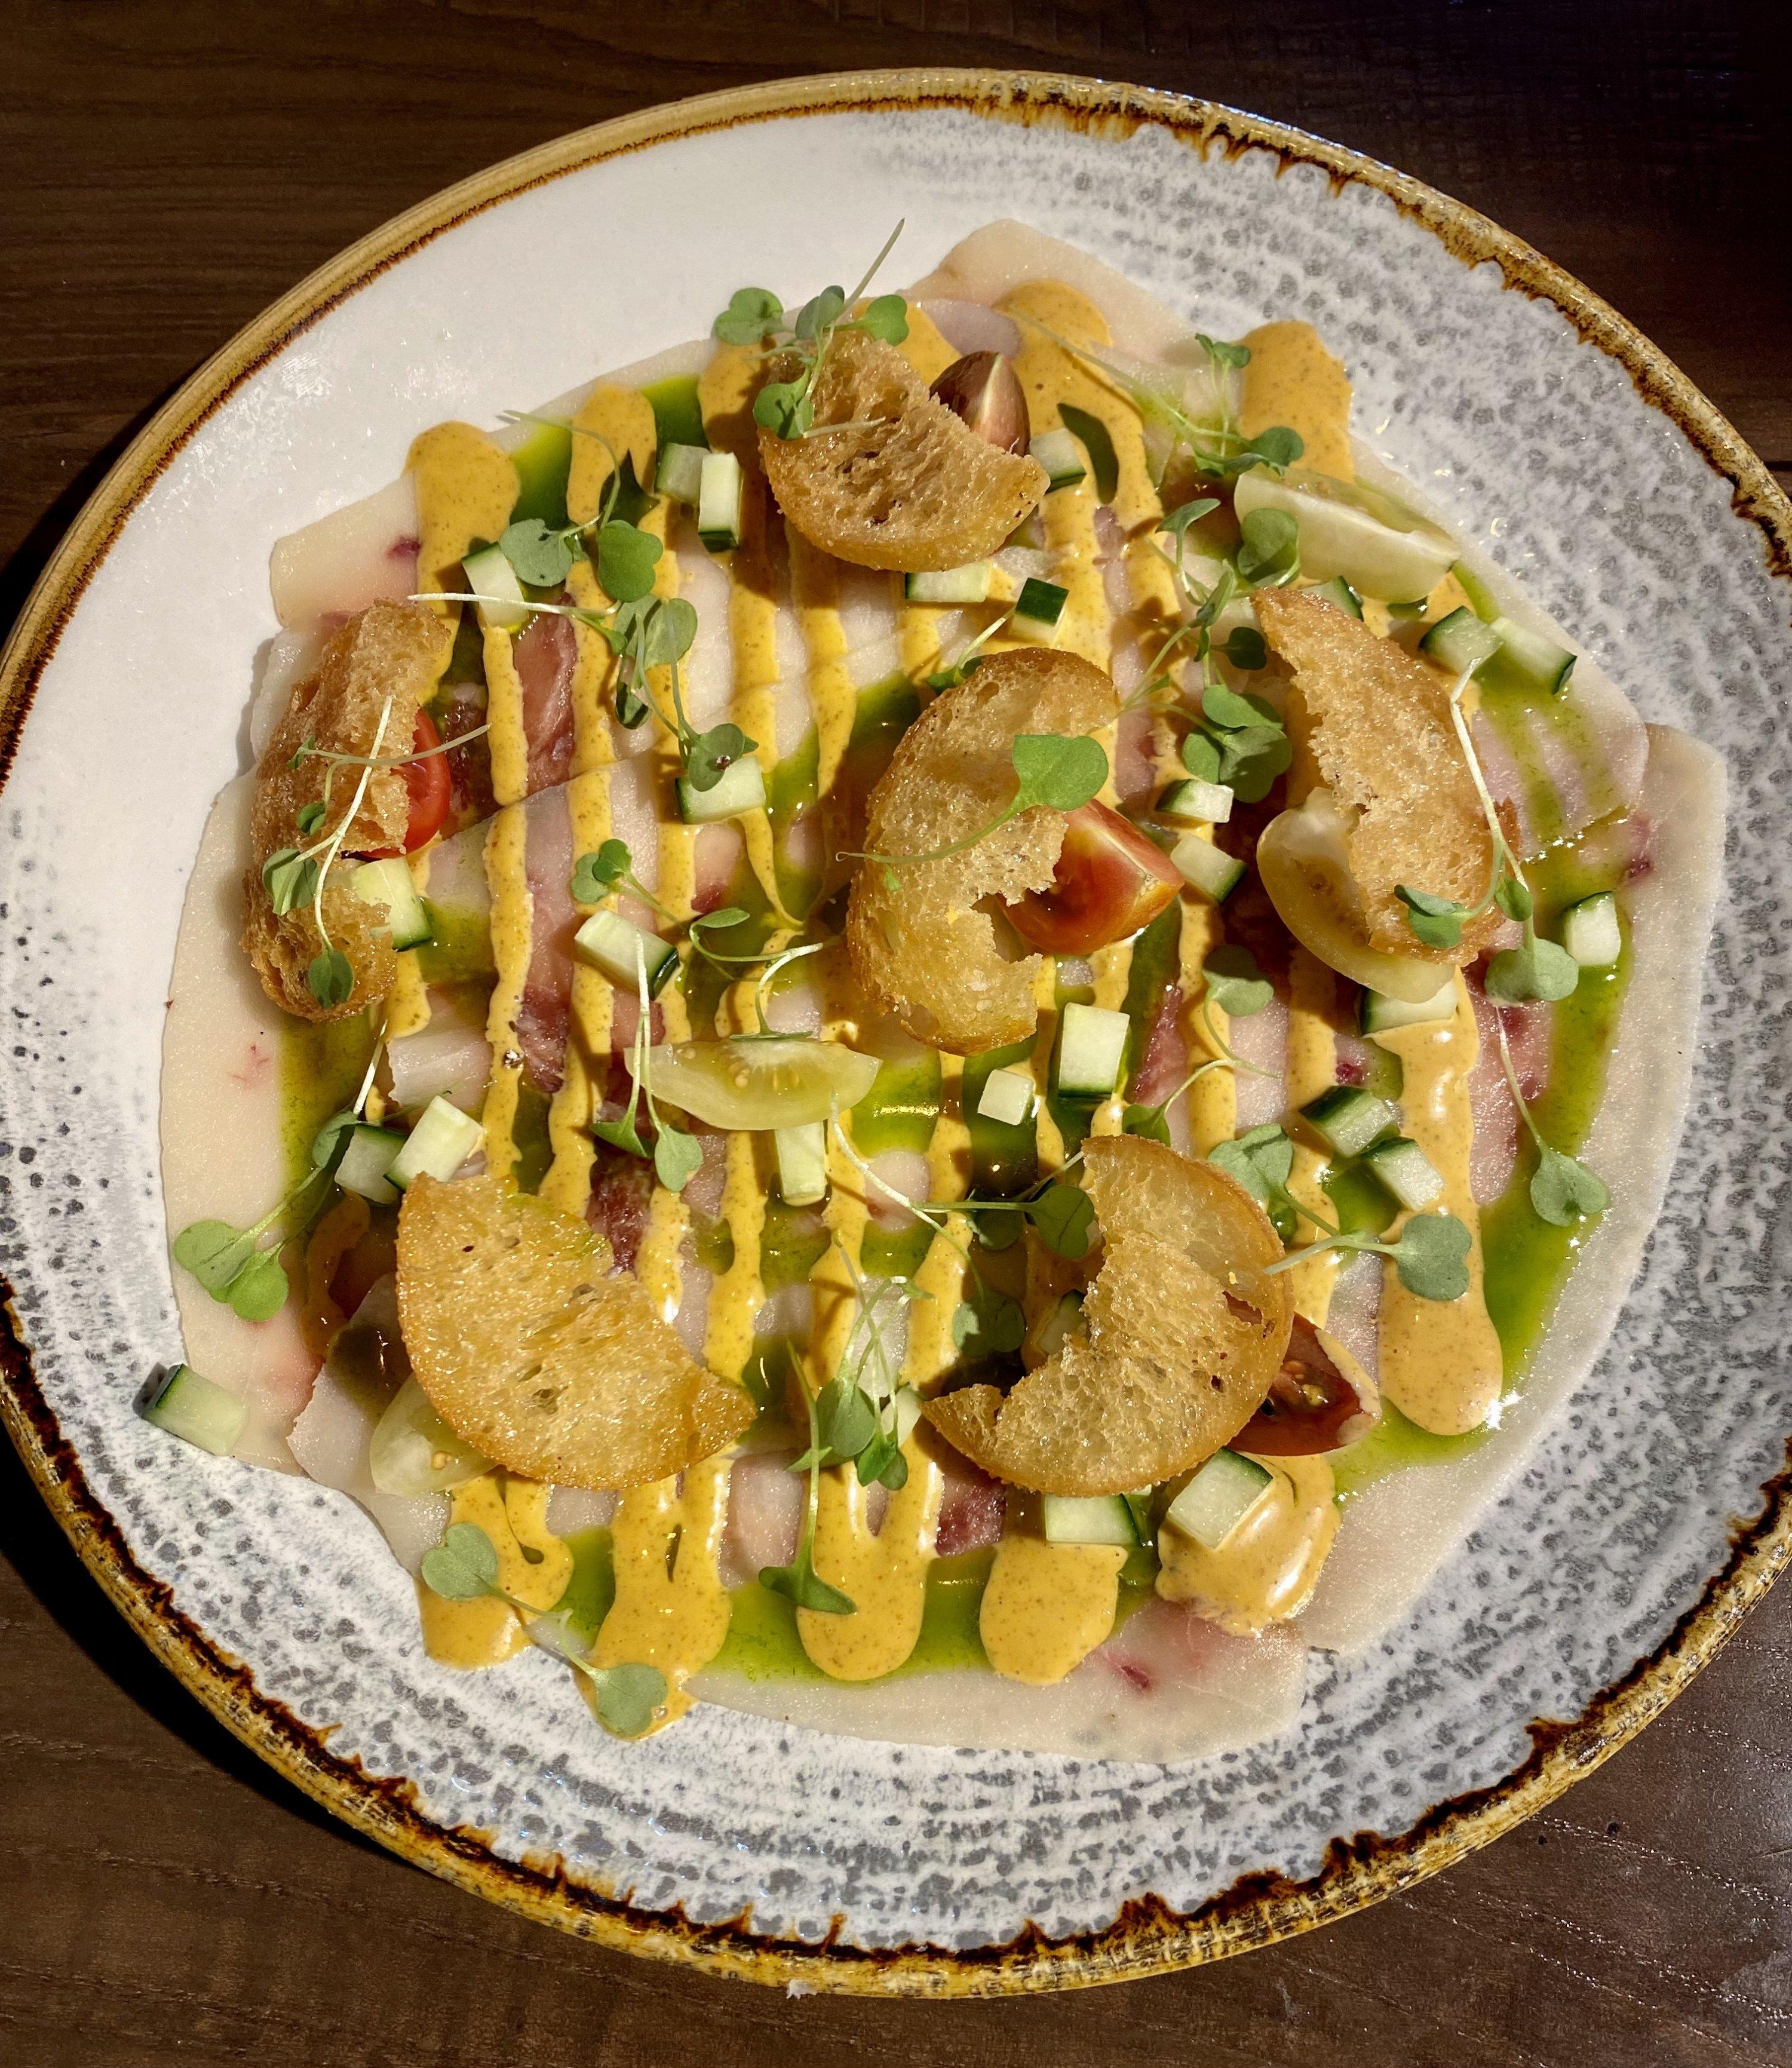 Carpaccio of swordfish.  Photo courtesy of Immigrant Food.